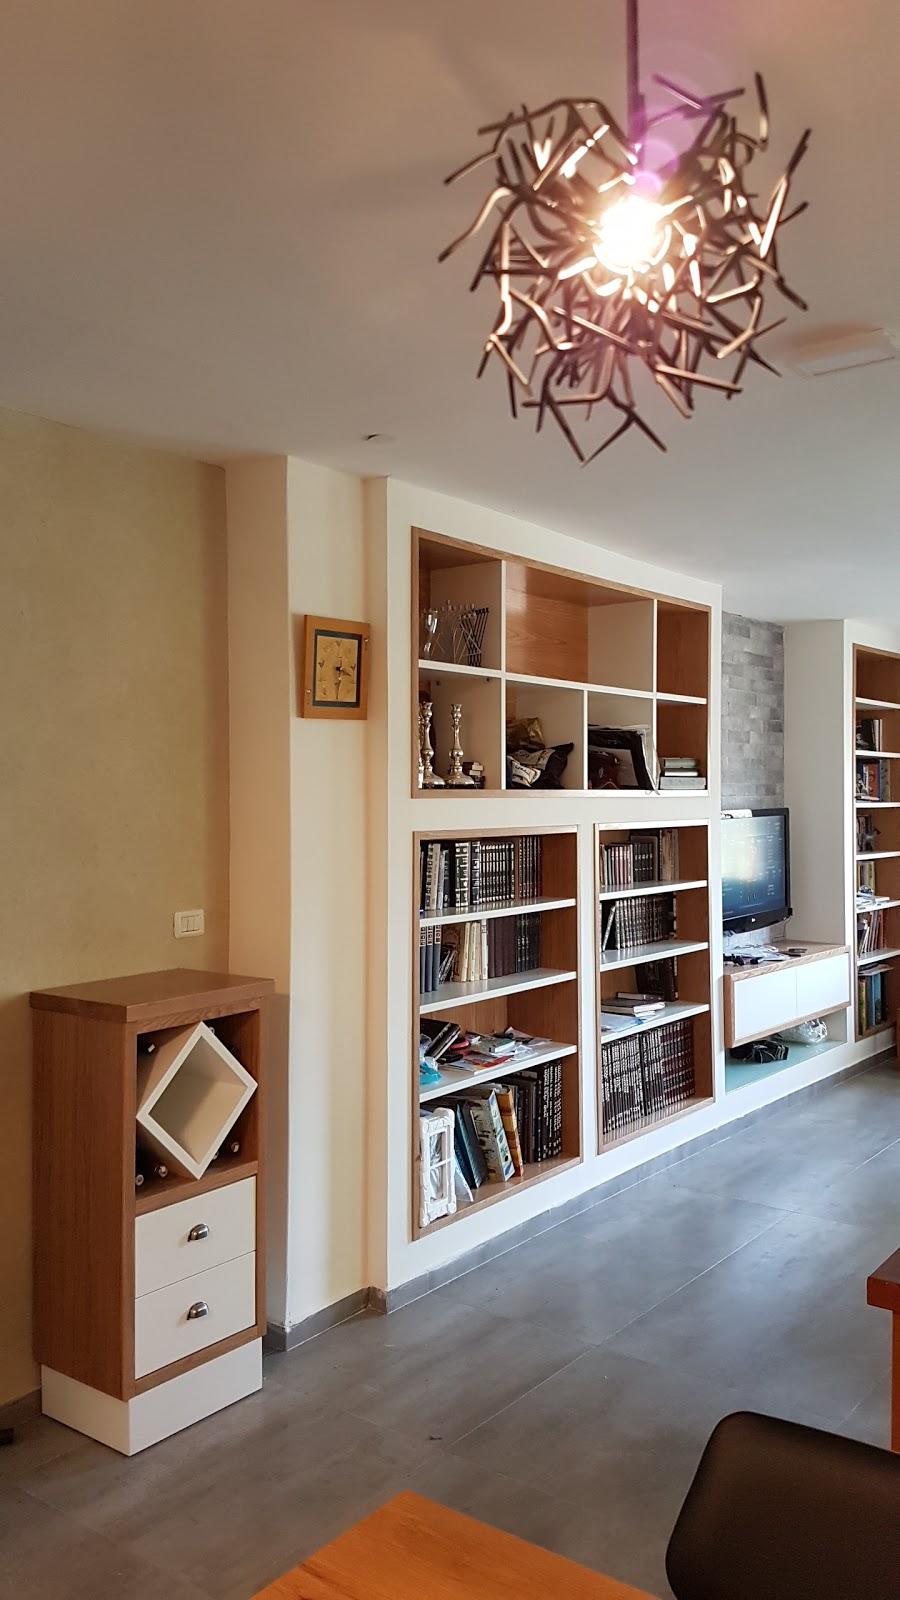 Zev Moskowitz plans and interior design